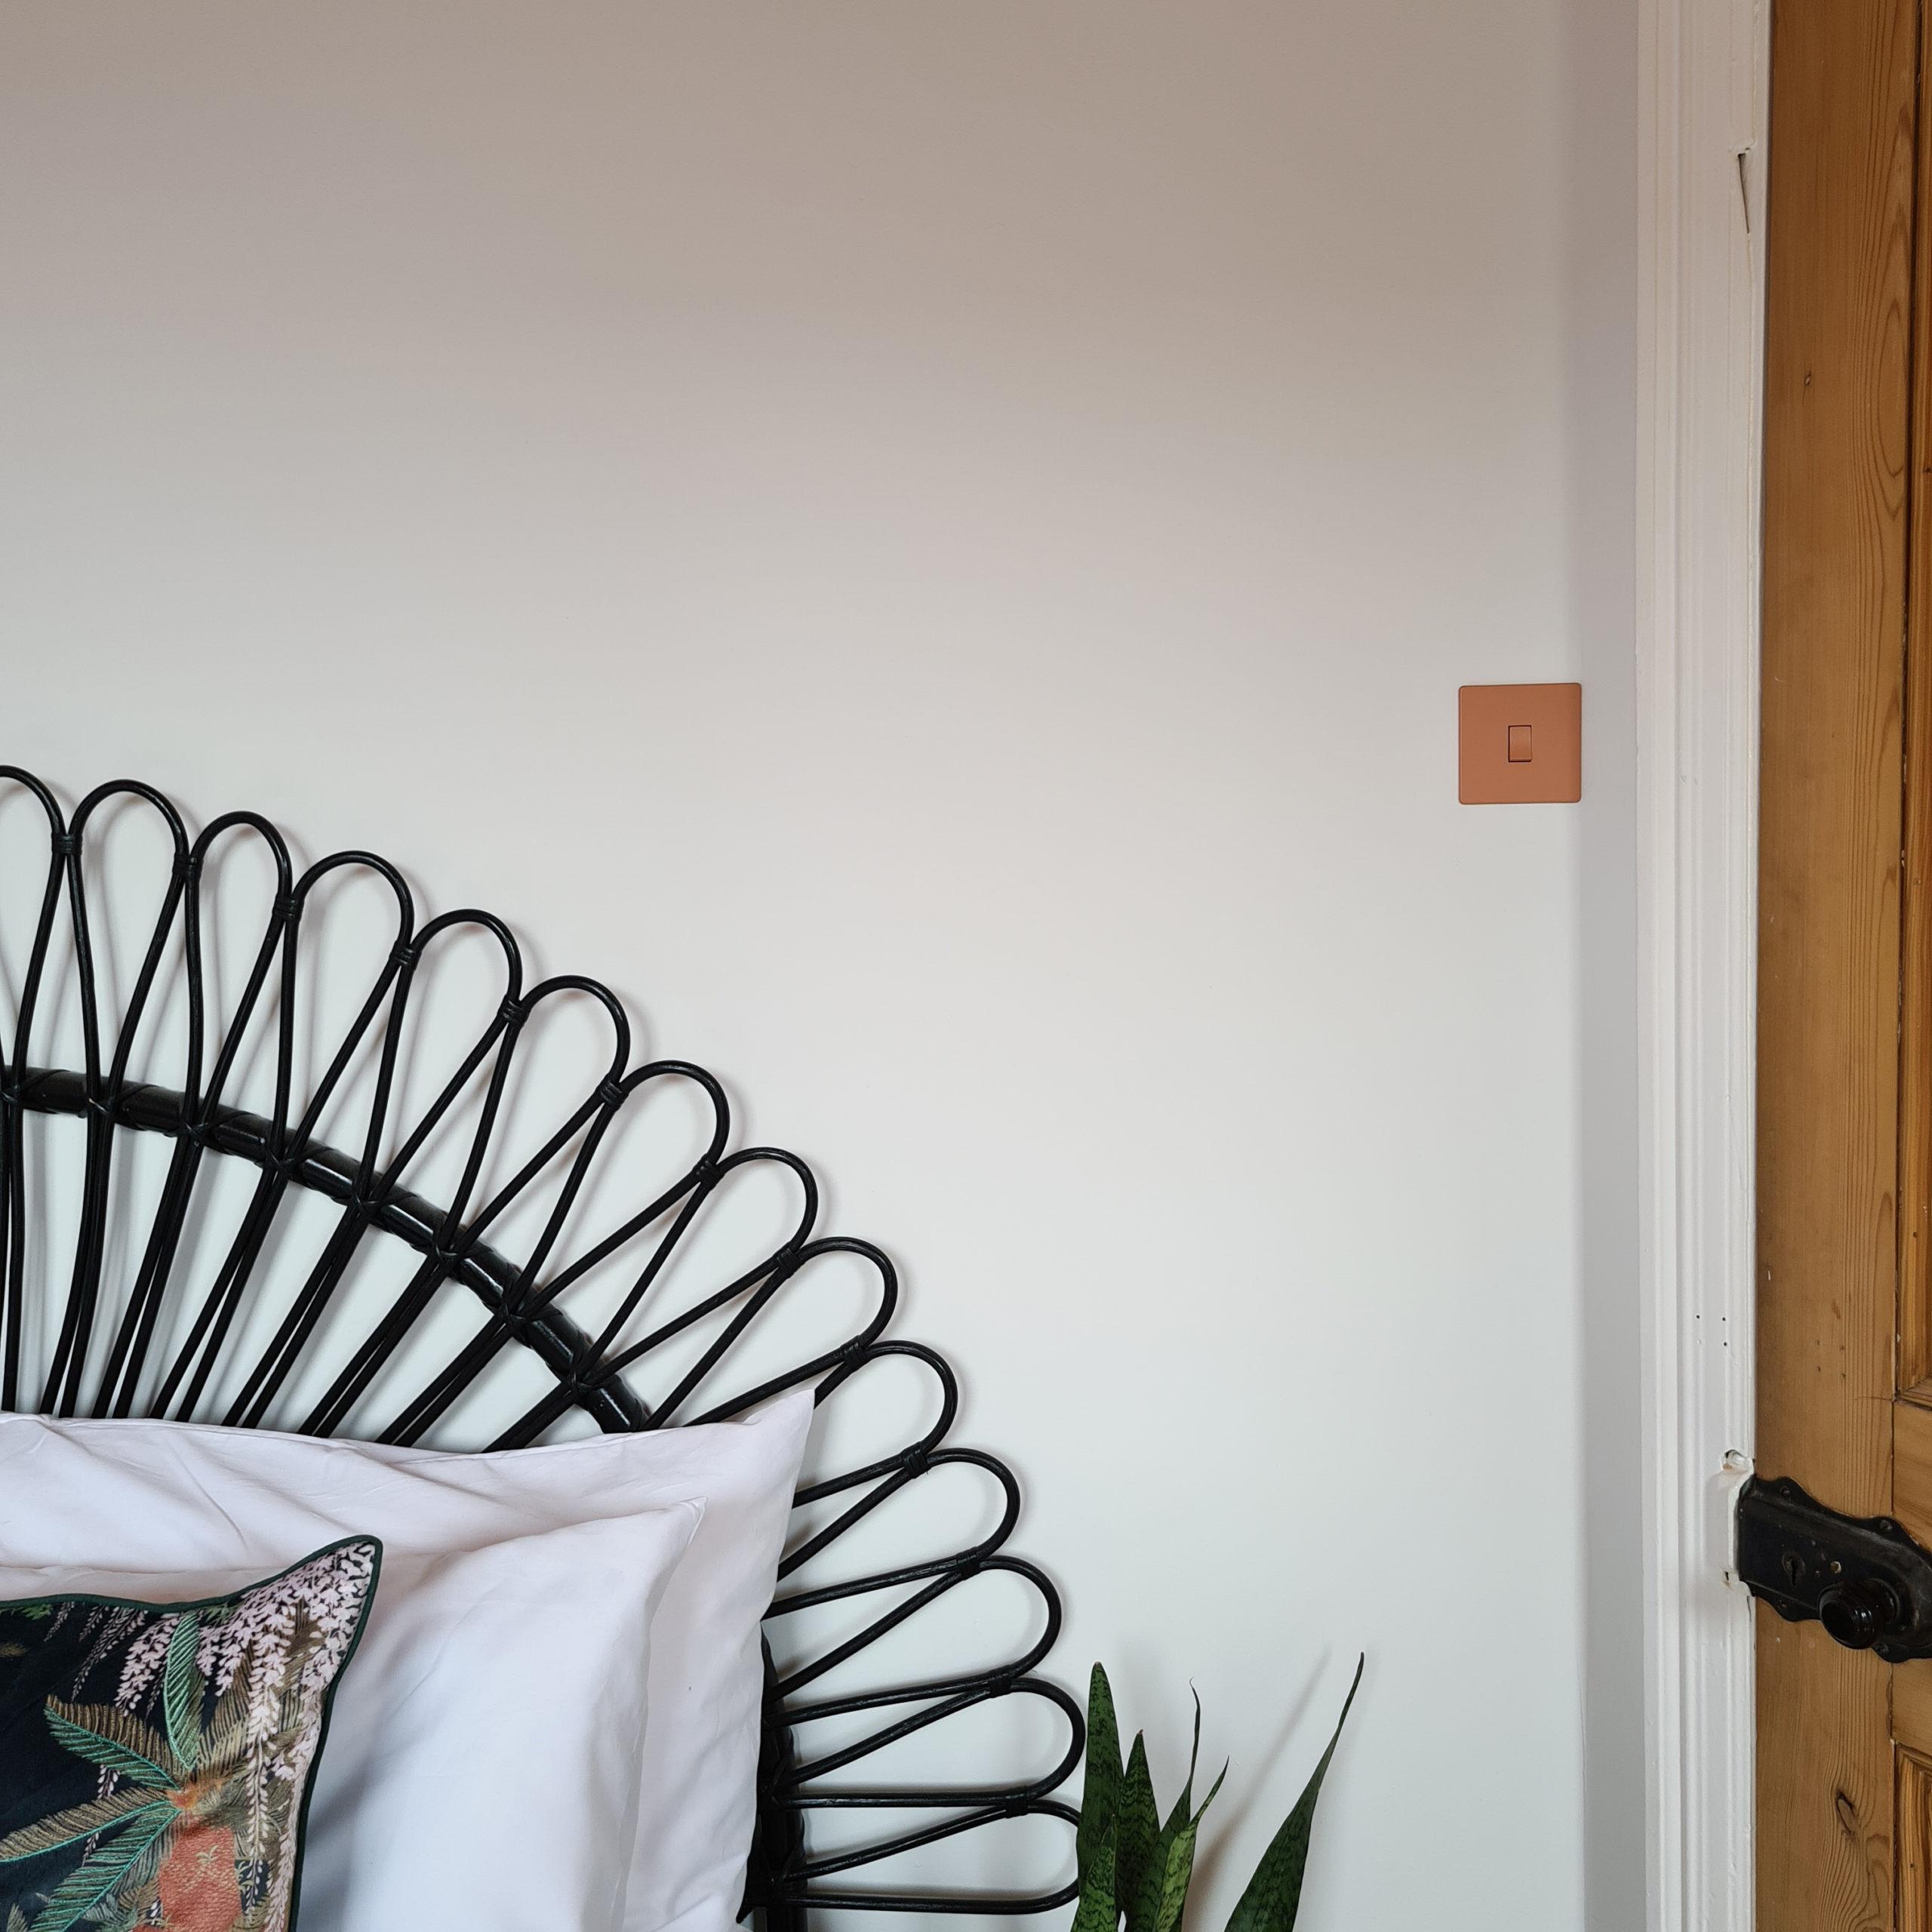 cinnamon single rocker switch on a white bedroom wall next to black rattan headboard